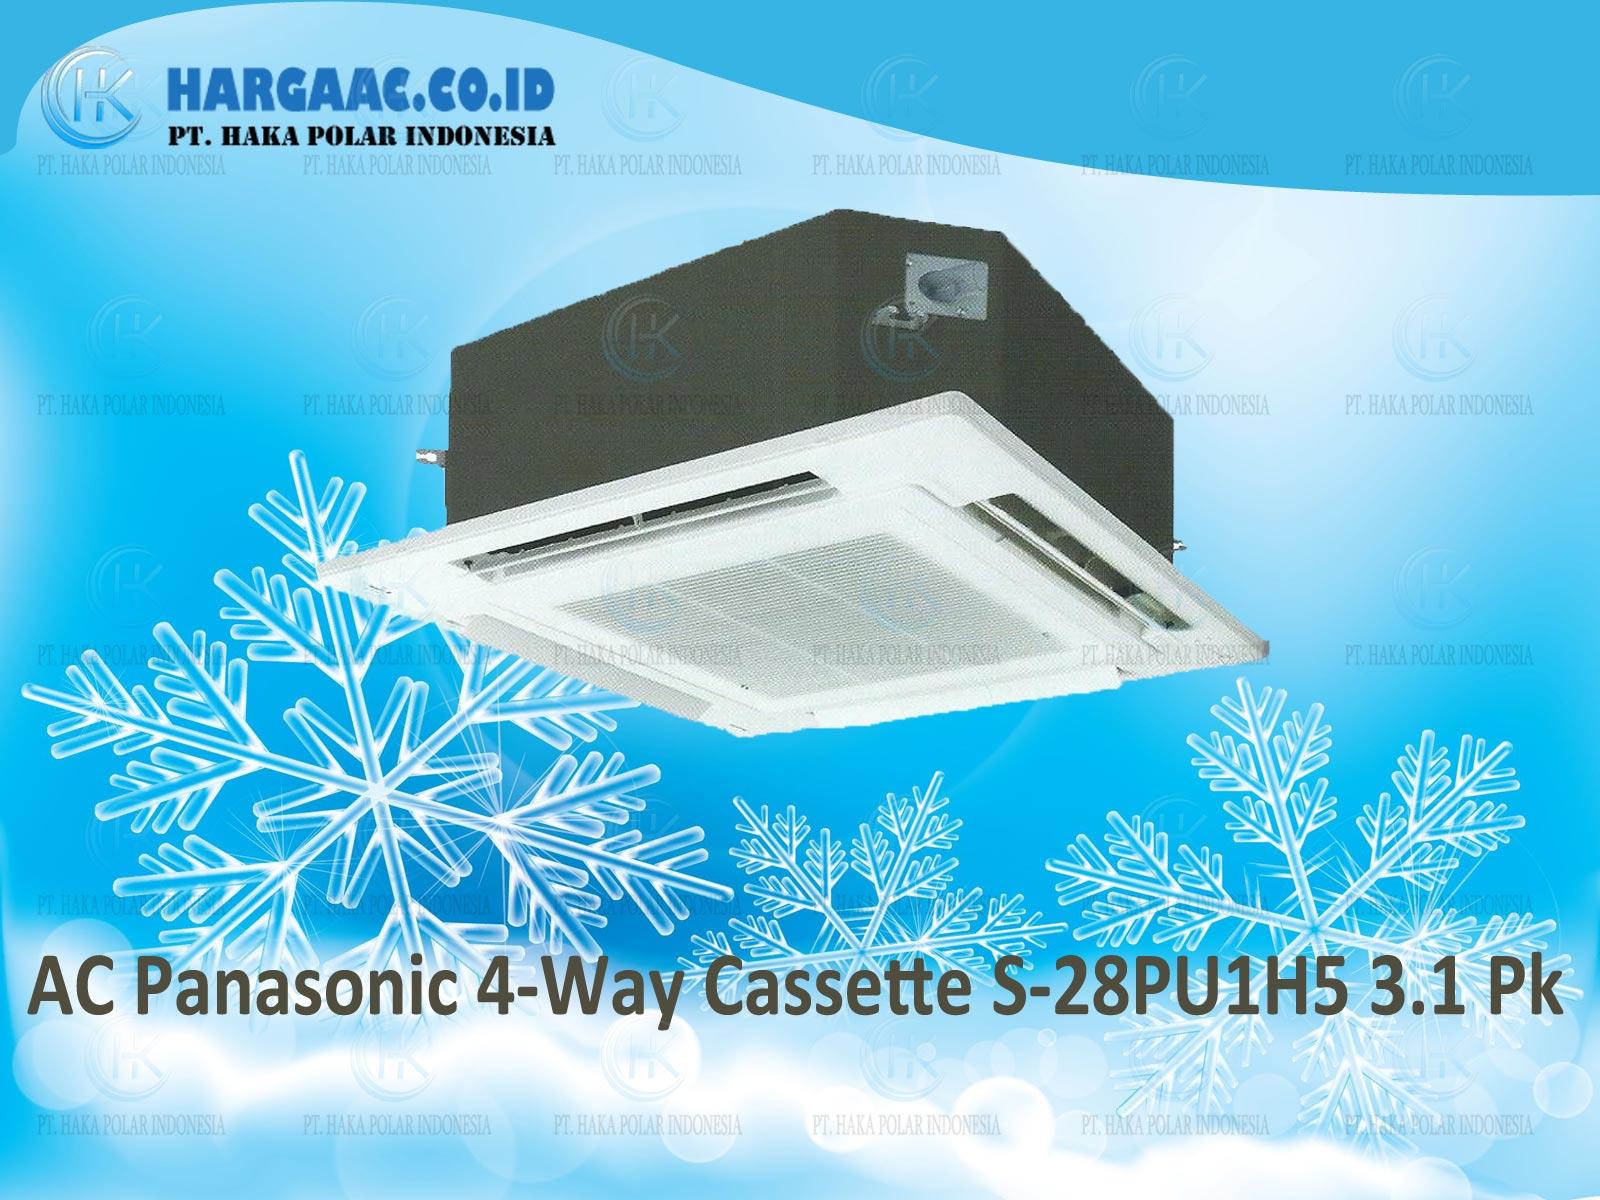 AC Panasonic 4-Way Cassette S-28PU1H5 1 Phase 3.1 PK R410a